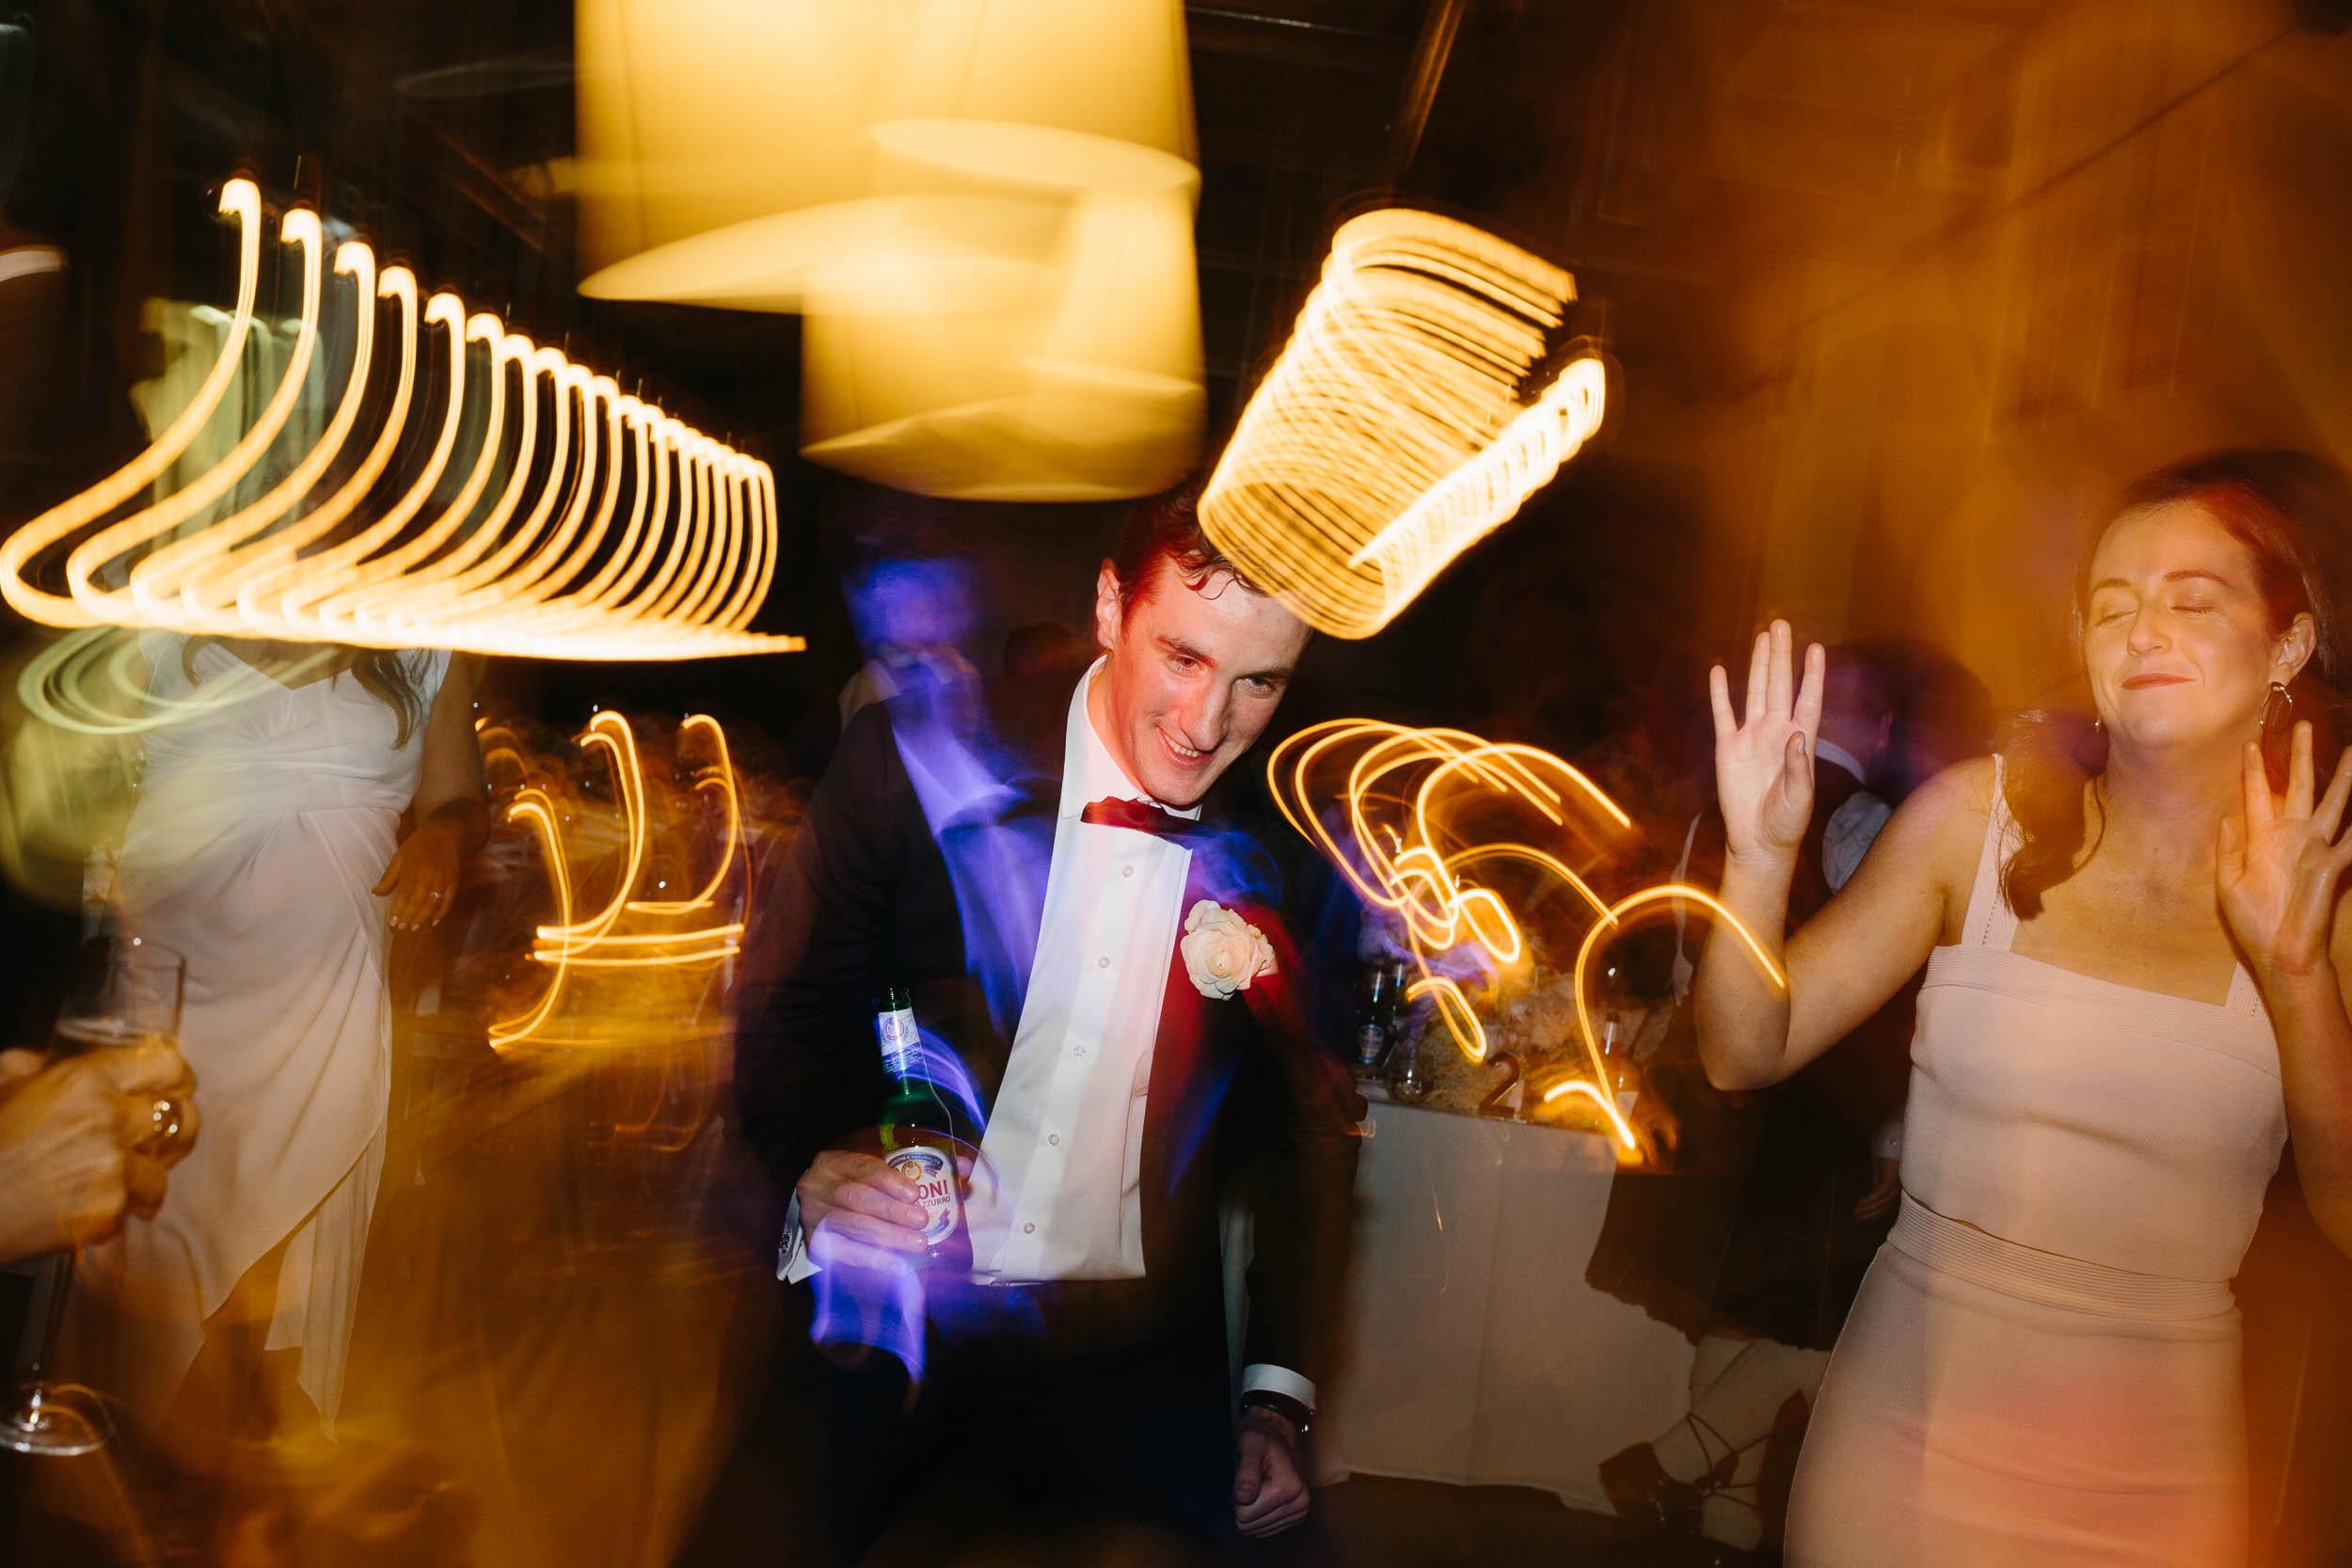 Kas-Richards-Wedding-Photographer-Melbourne-City-Wedding-Alto-Event-Space-Jane-Hill-Bridal-Gown-72.jpg